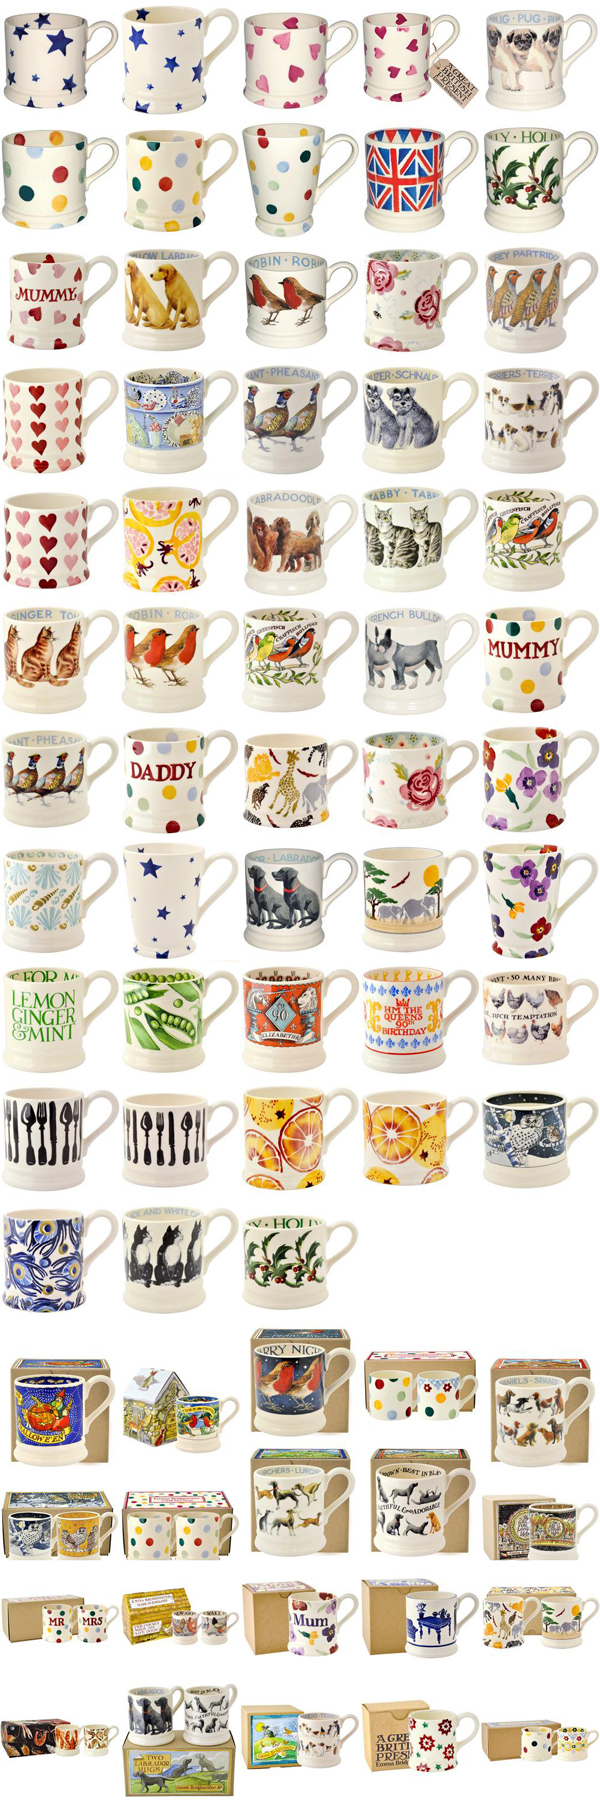 emma-bridgewater-mugs-2